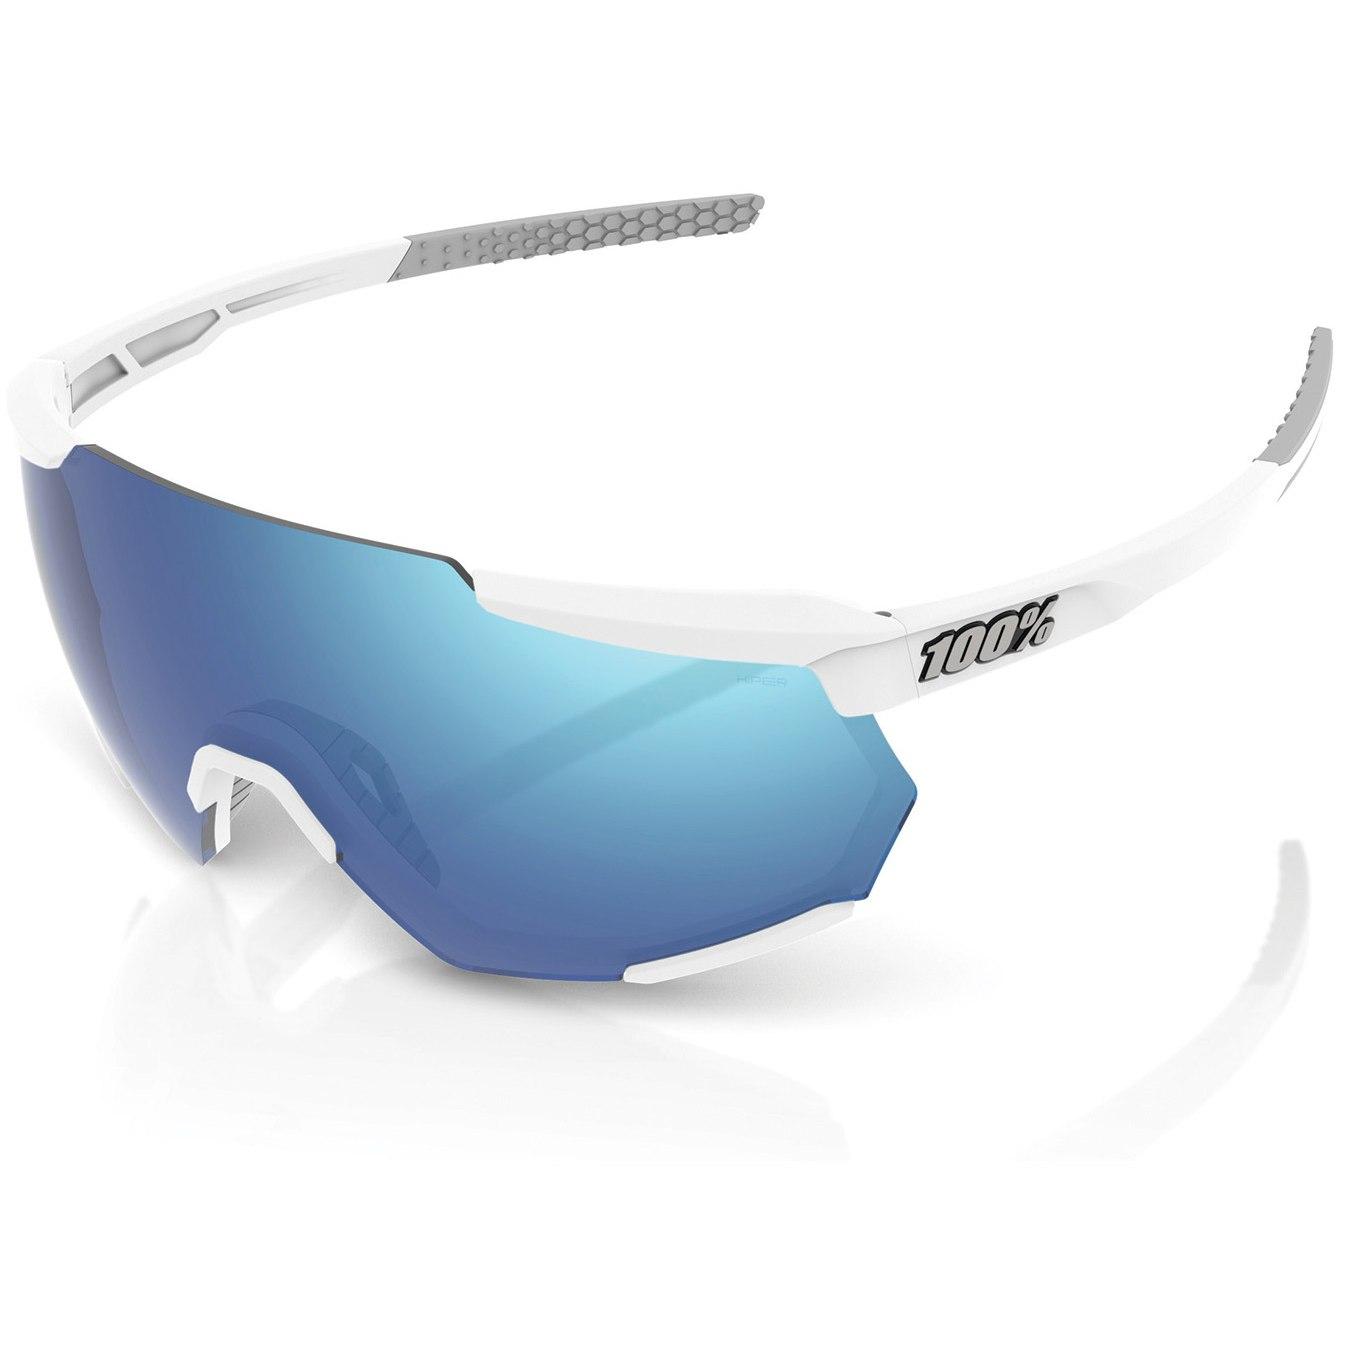 100% Racetrap HiPER Mirror Glasses - Matte White/Blue Multilayer + Clear